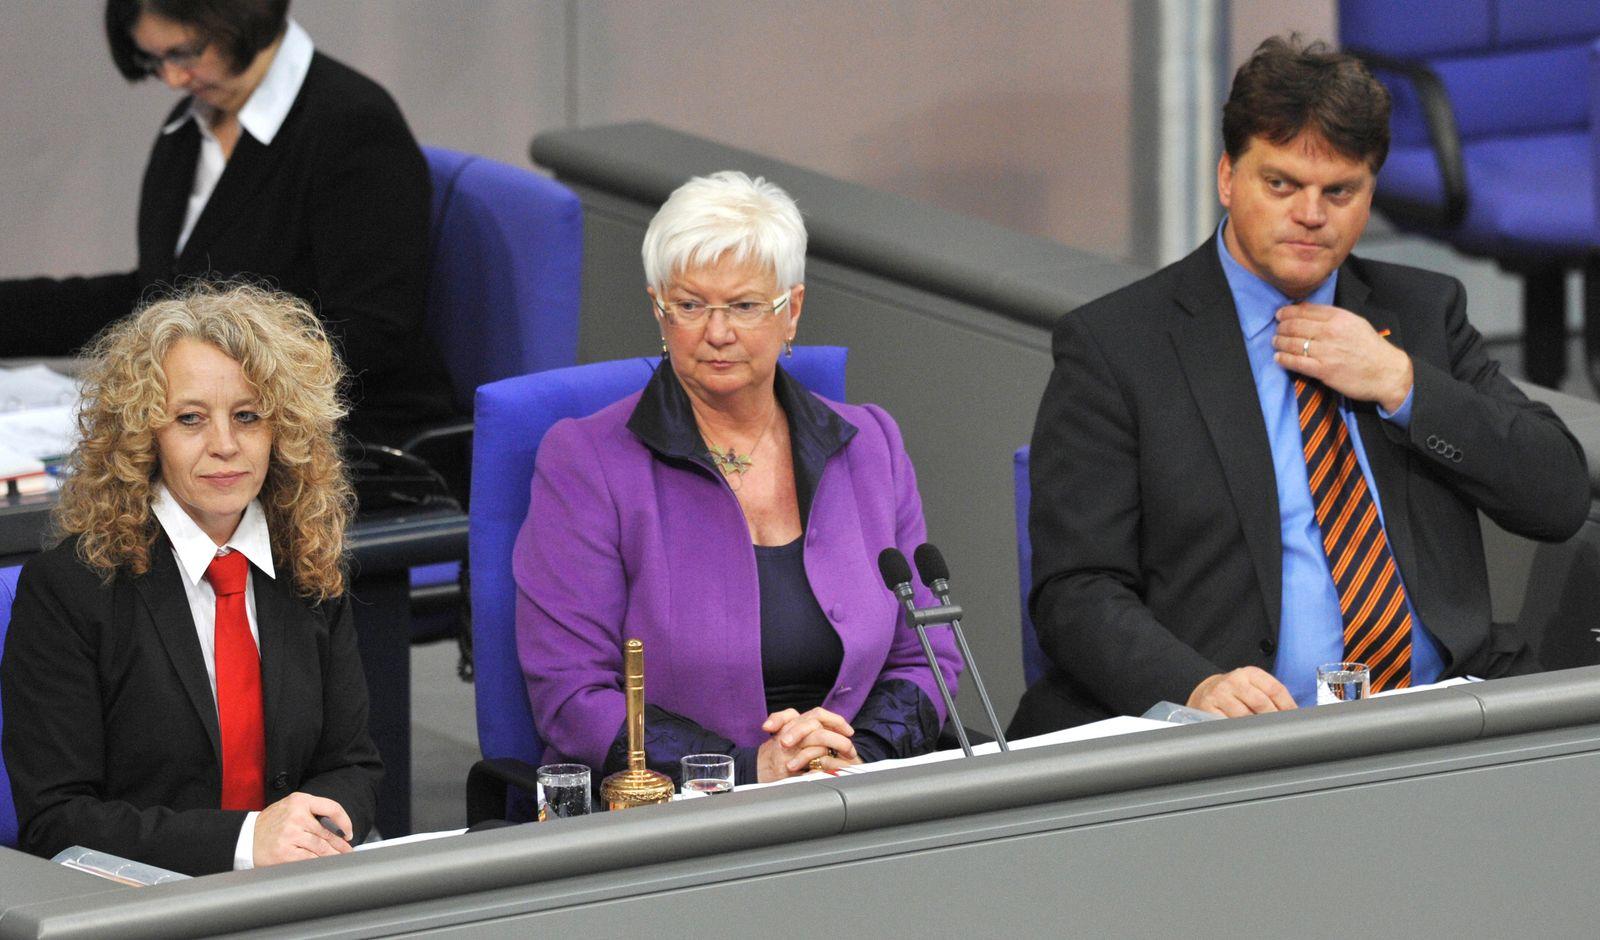 Bundestag Krawattenzwang